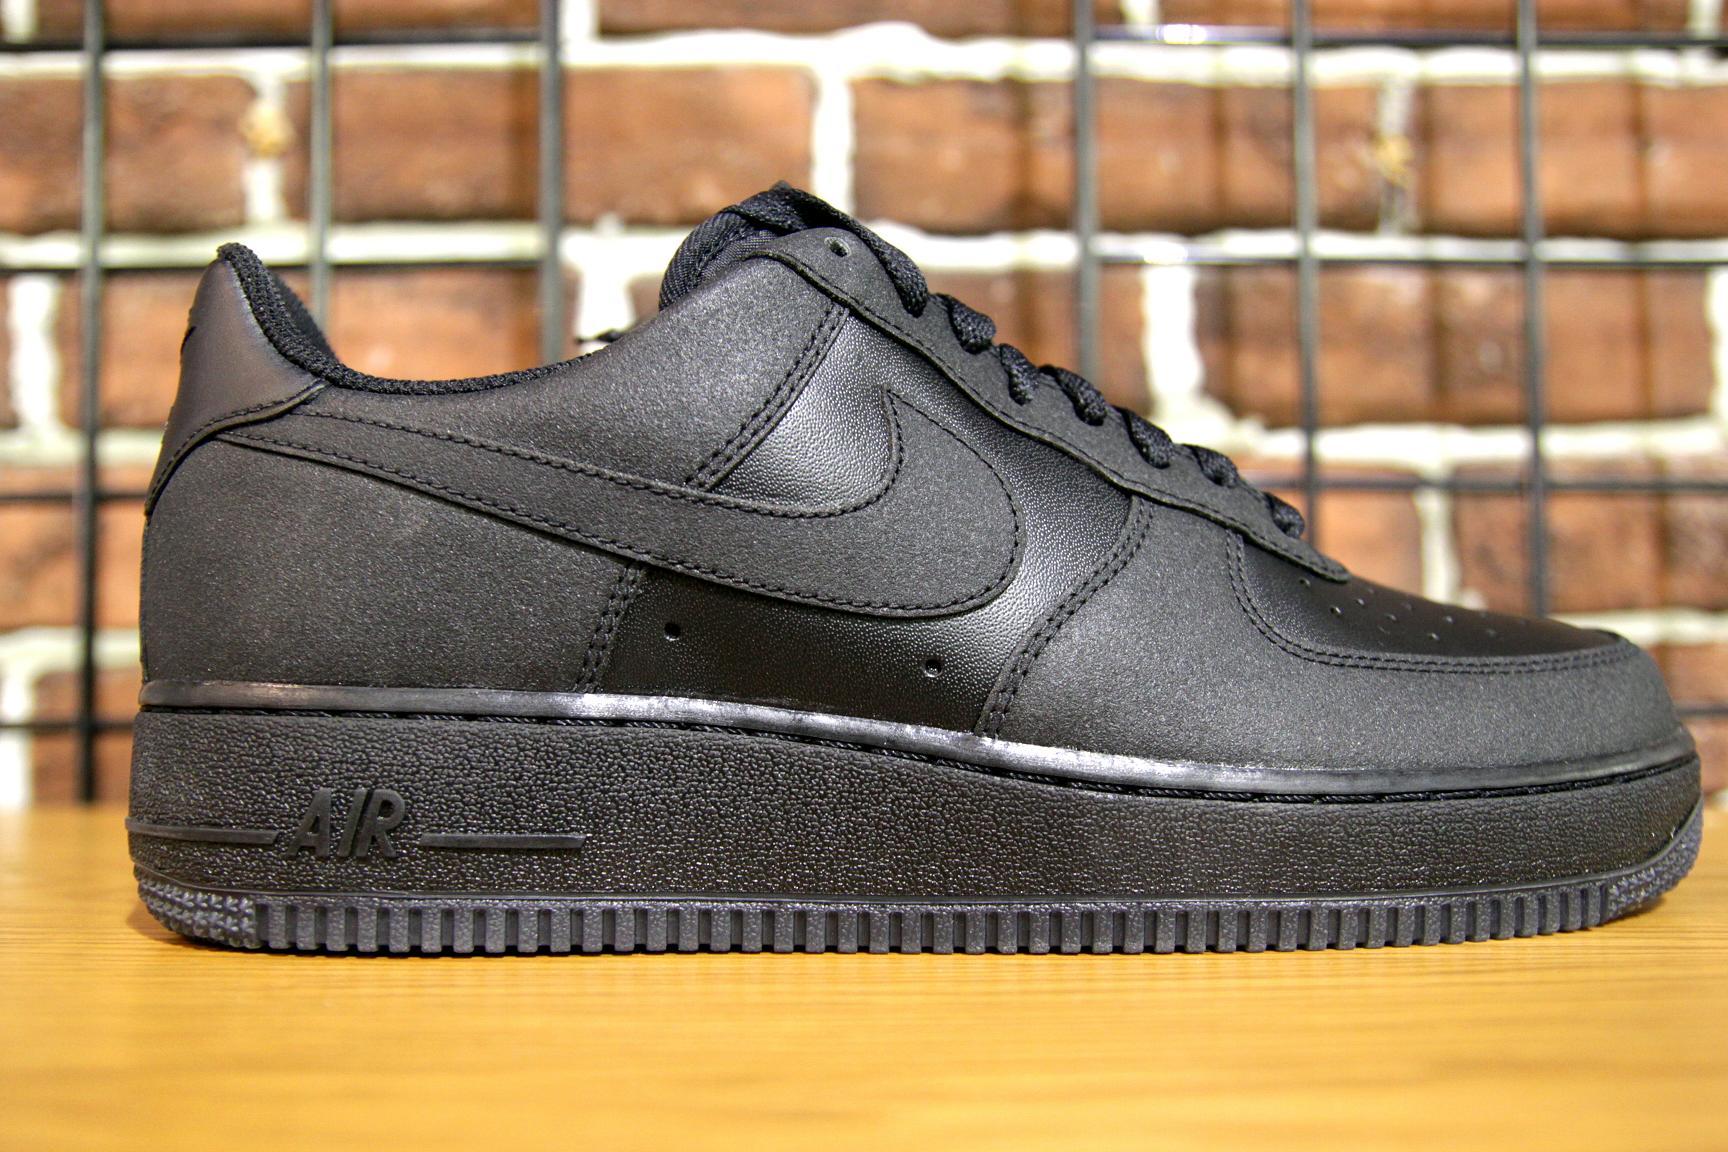 Nike Air Force 1 Tech Tuff ristorantedugrandpere.it